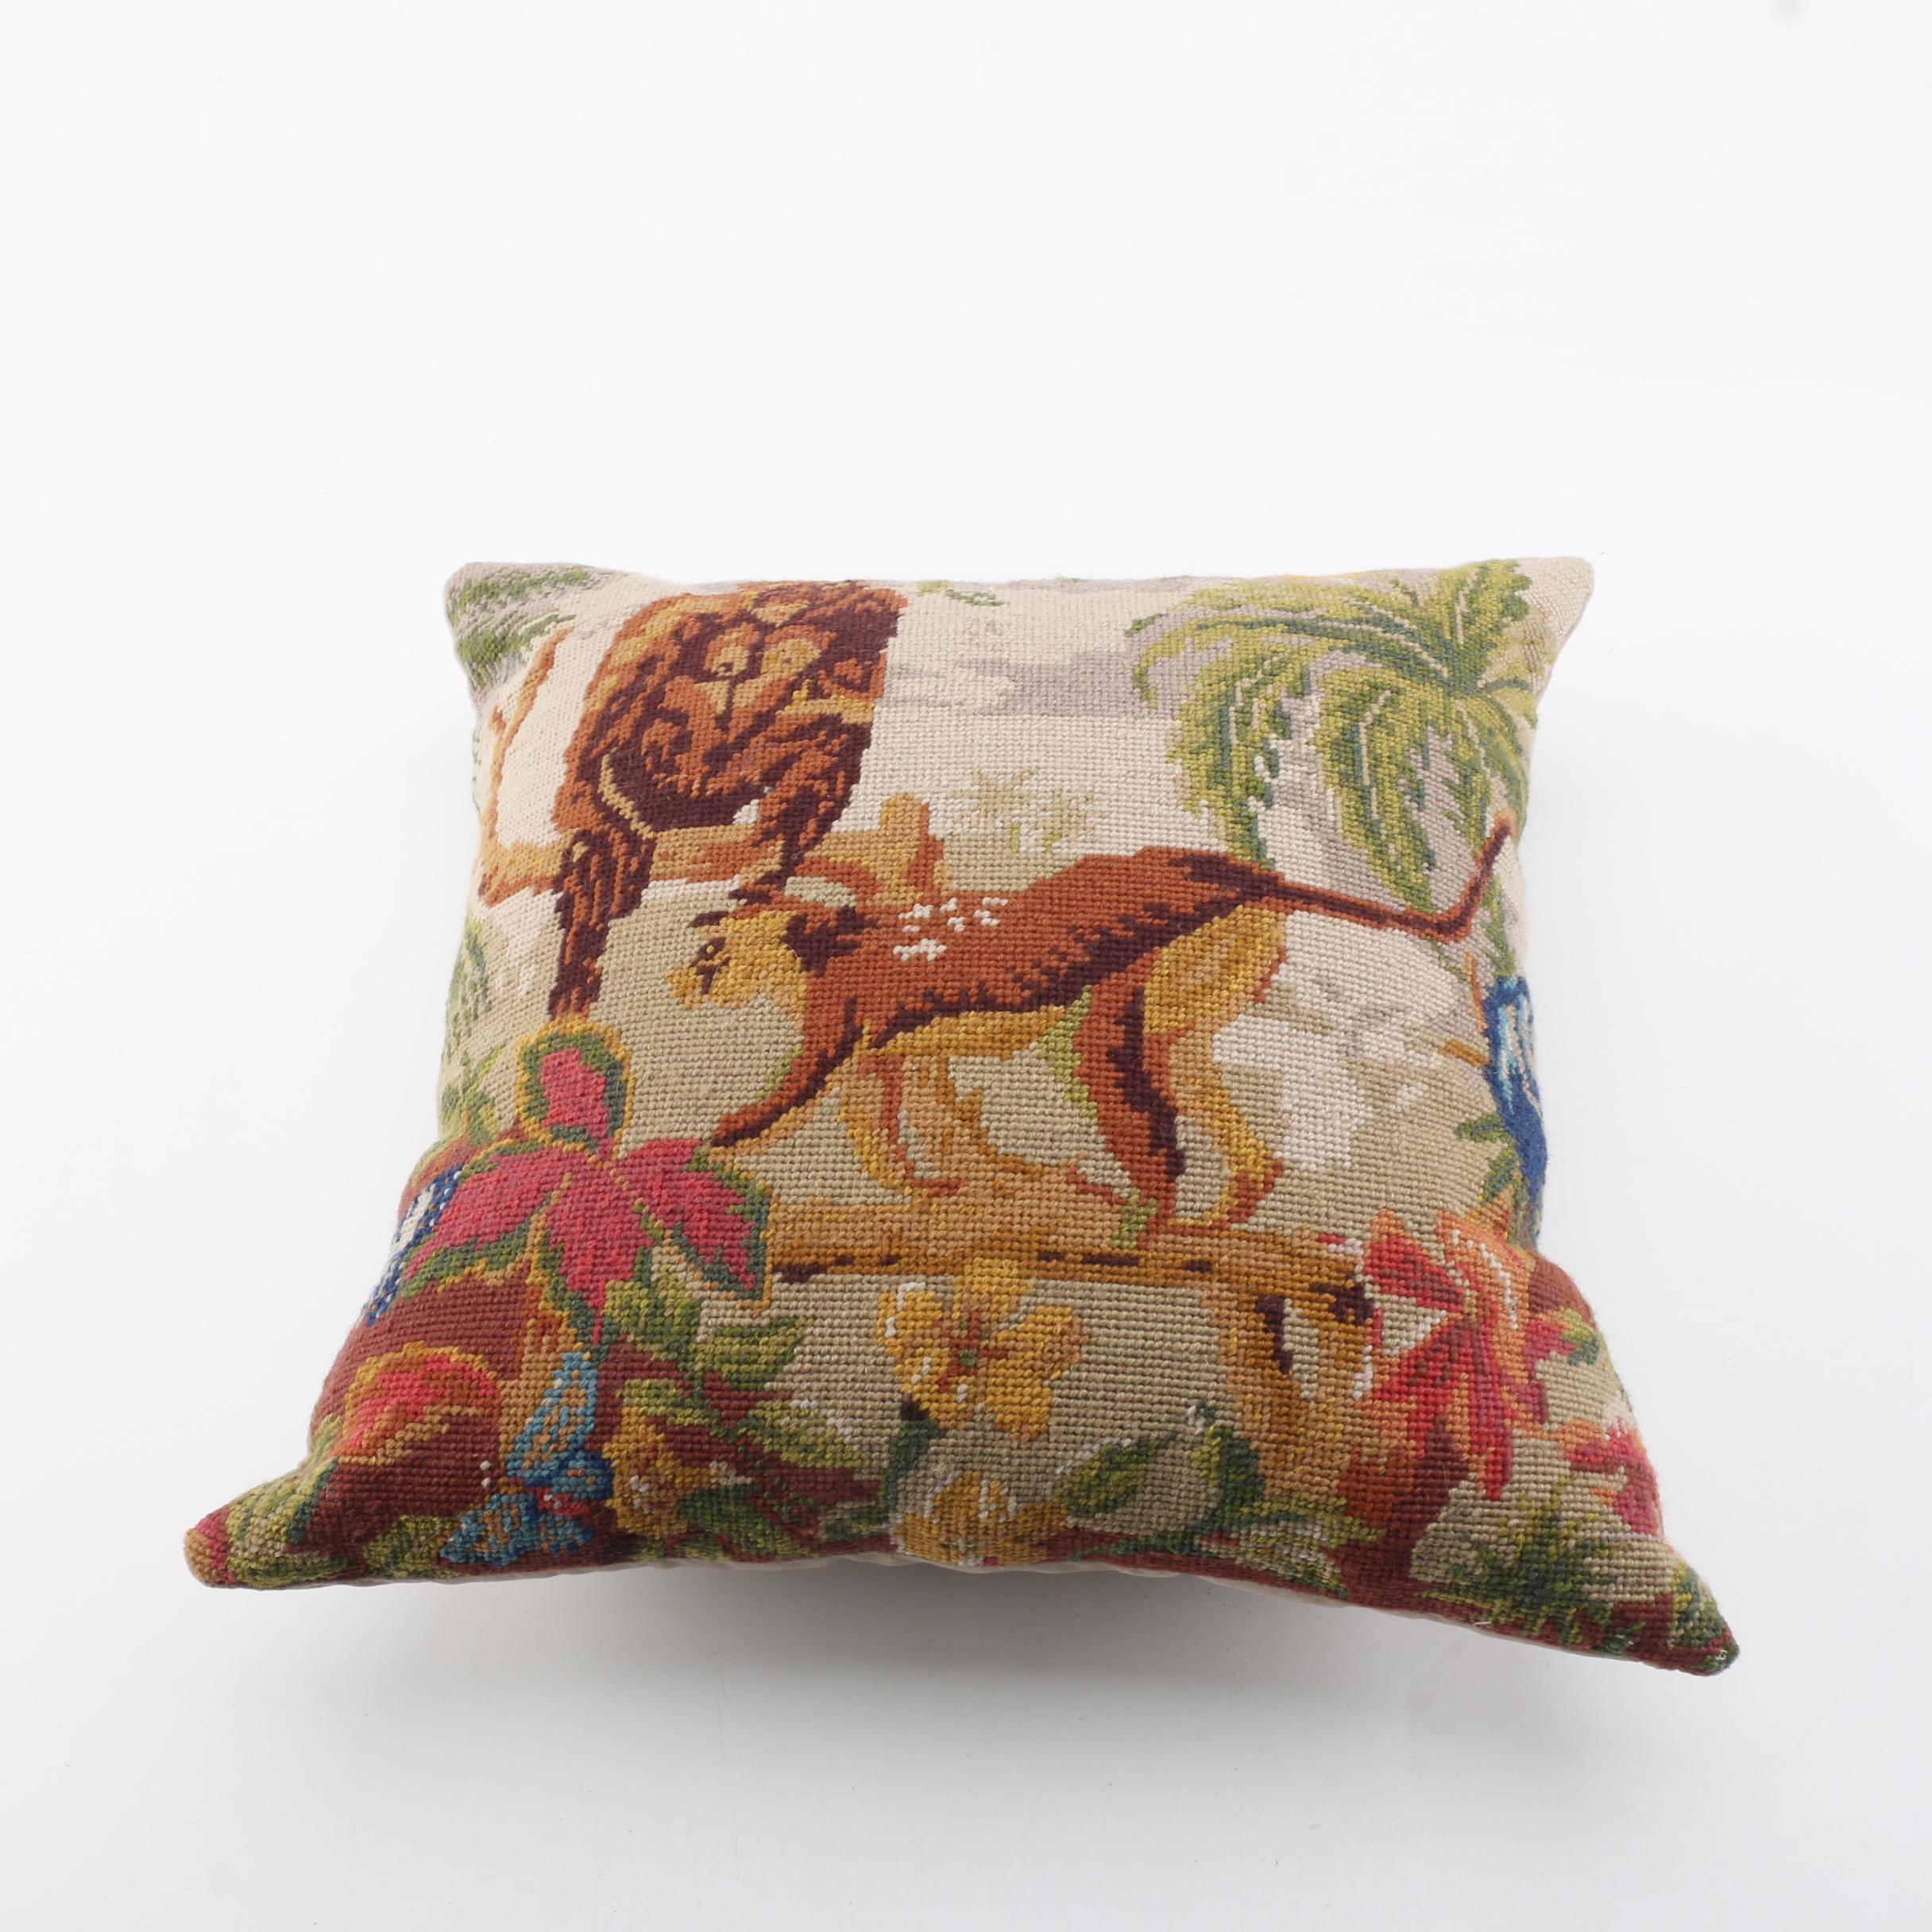 Needlepoint Monkey Themed Accent Pillow